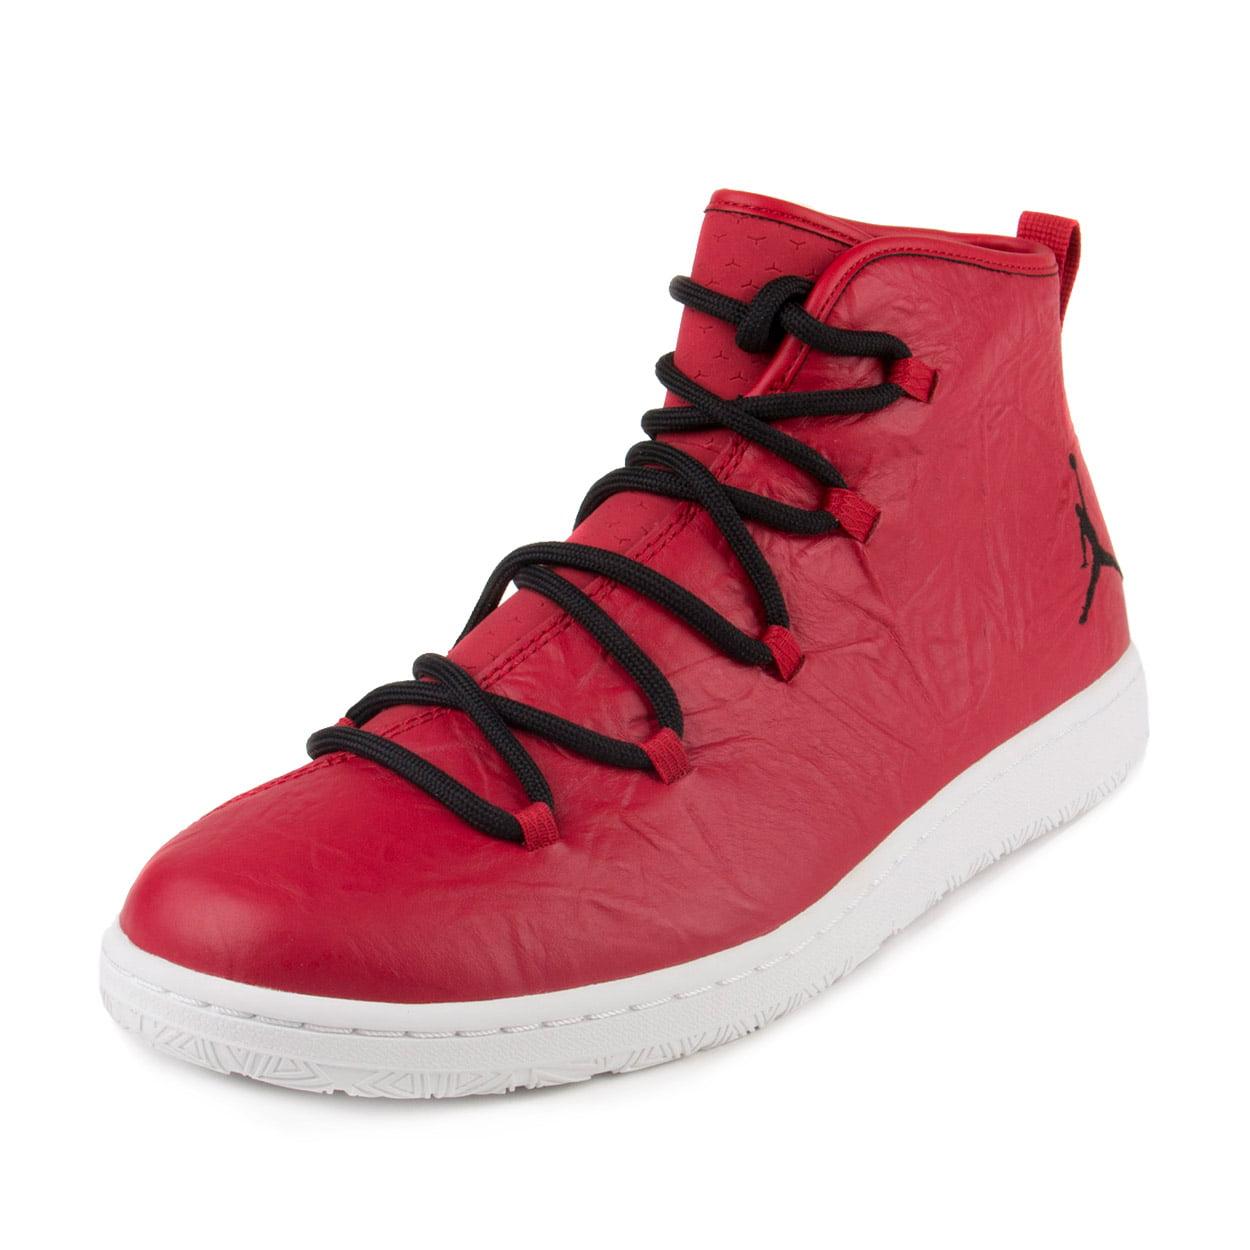 Nike Mens Jordan Galaxy Gym Red/Black-White 820255-601